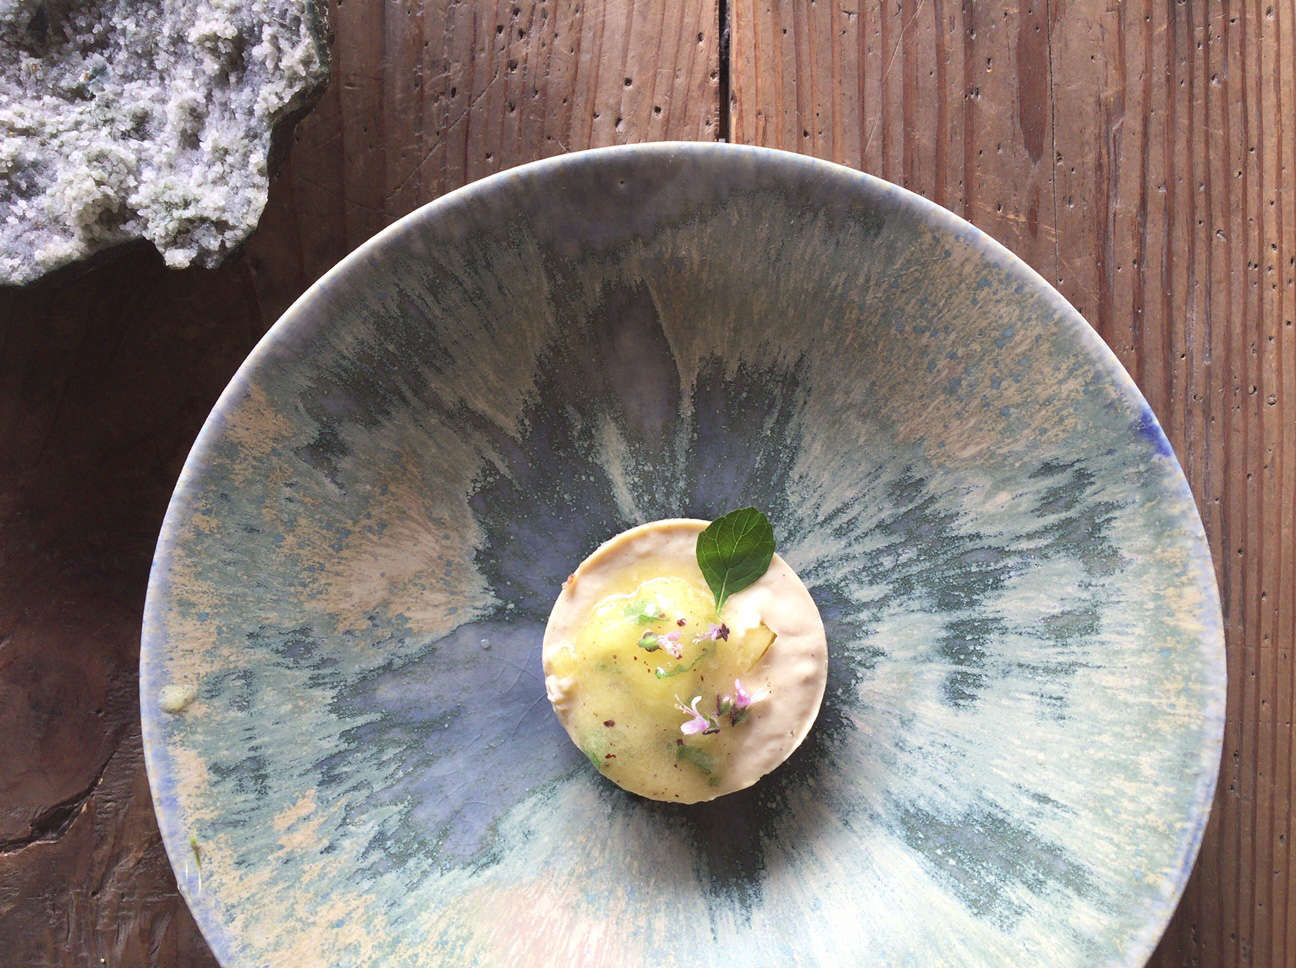 japanese ceramic bowl by shinsaku nakazono at stardust vegetarian cafe in kyoto 16